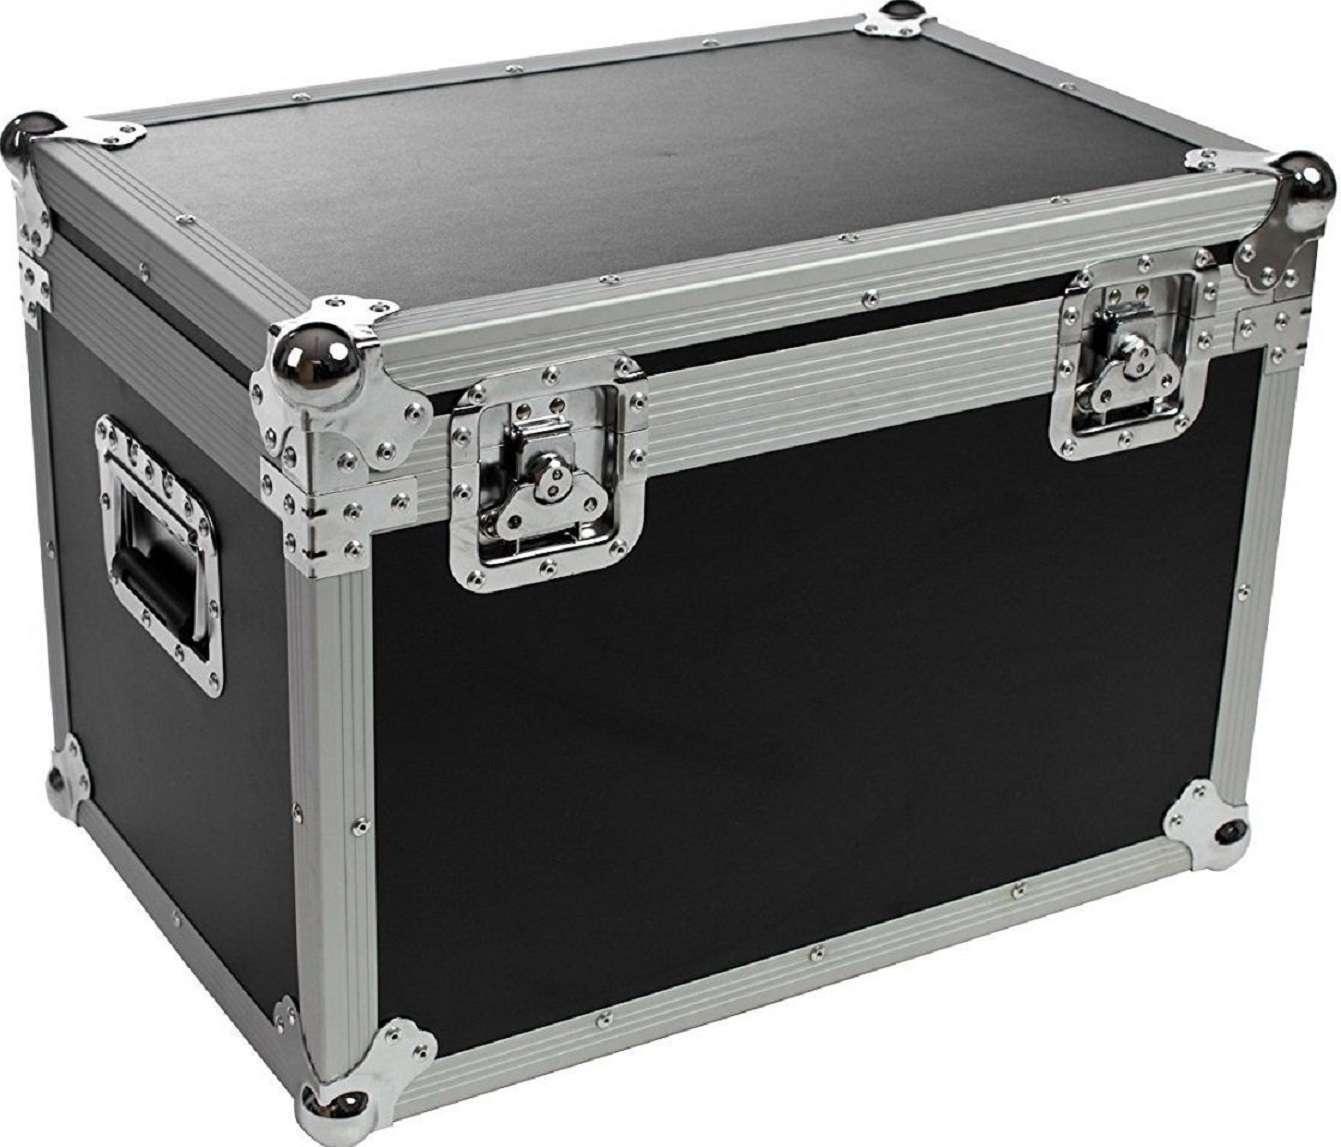 52x40x42 cm Transport Werkzeug Case Box Kiste SC-1 Transportcase Montagekiste